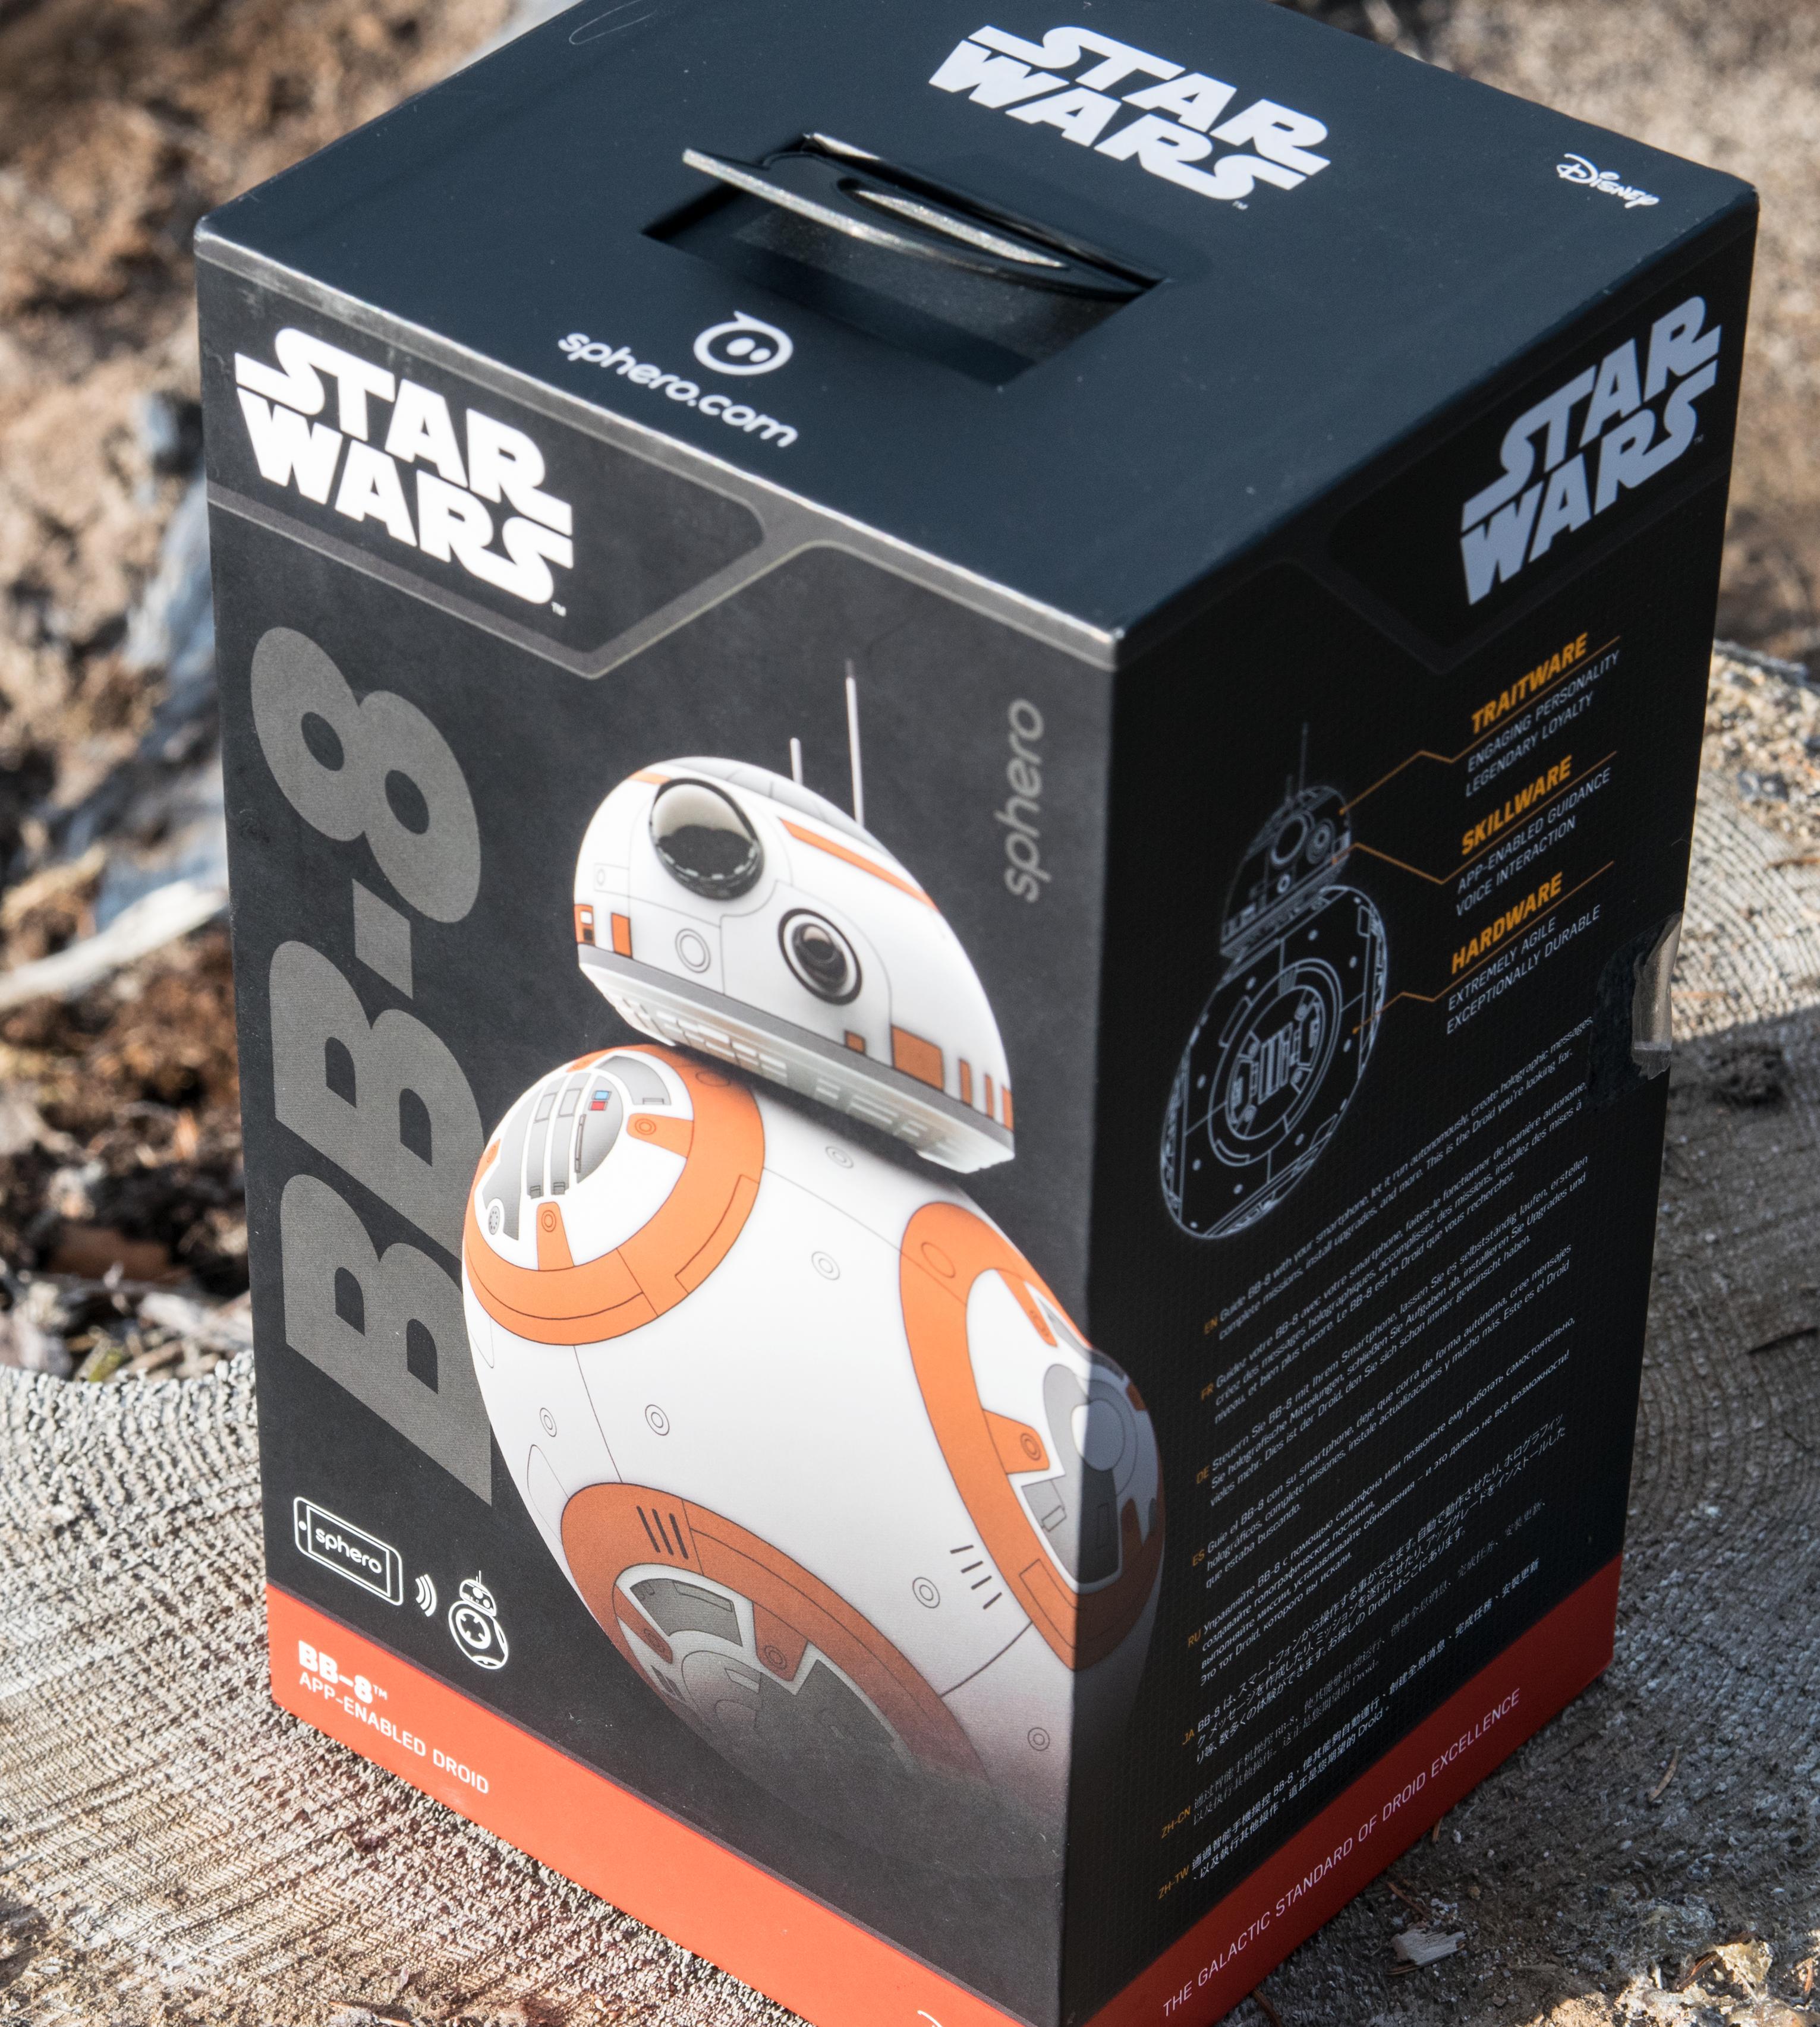 BB-8 kommer i en stor og fin eske med Star Wars- og Disney-logoer over det meste. Foto: Finn Jarle Kvalheim, Tek.no